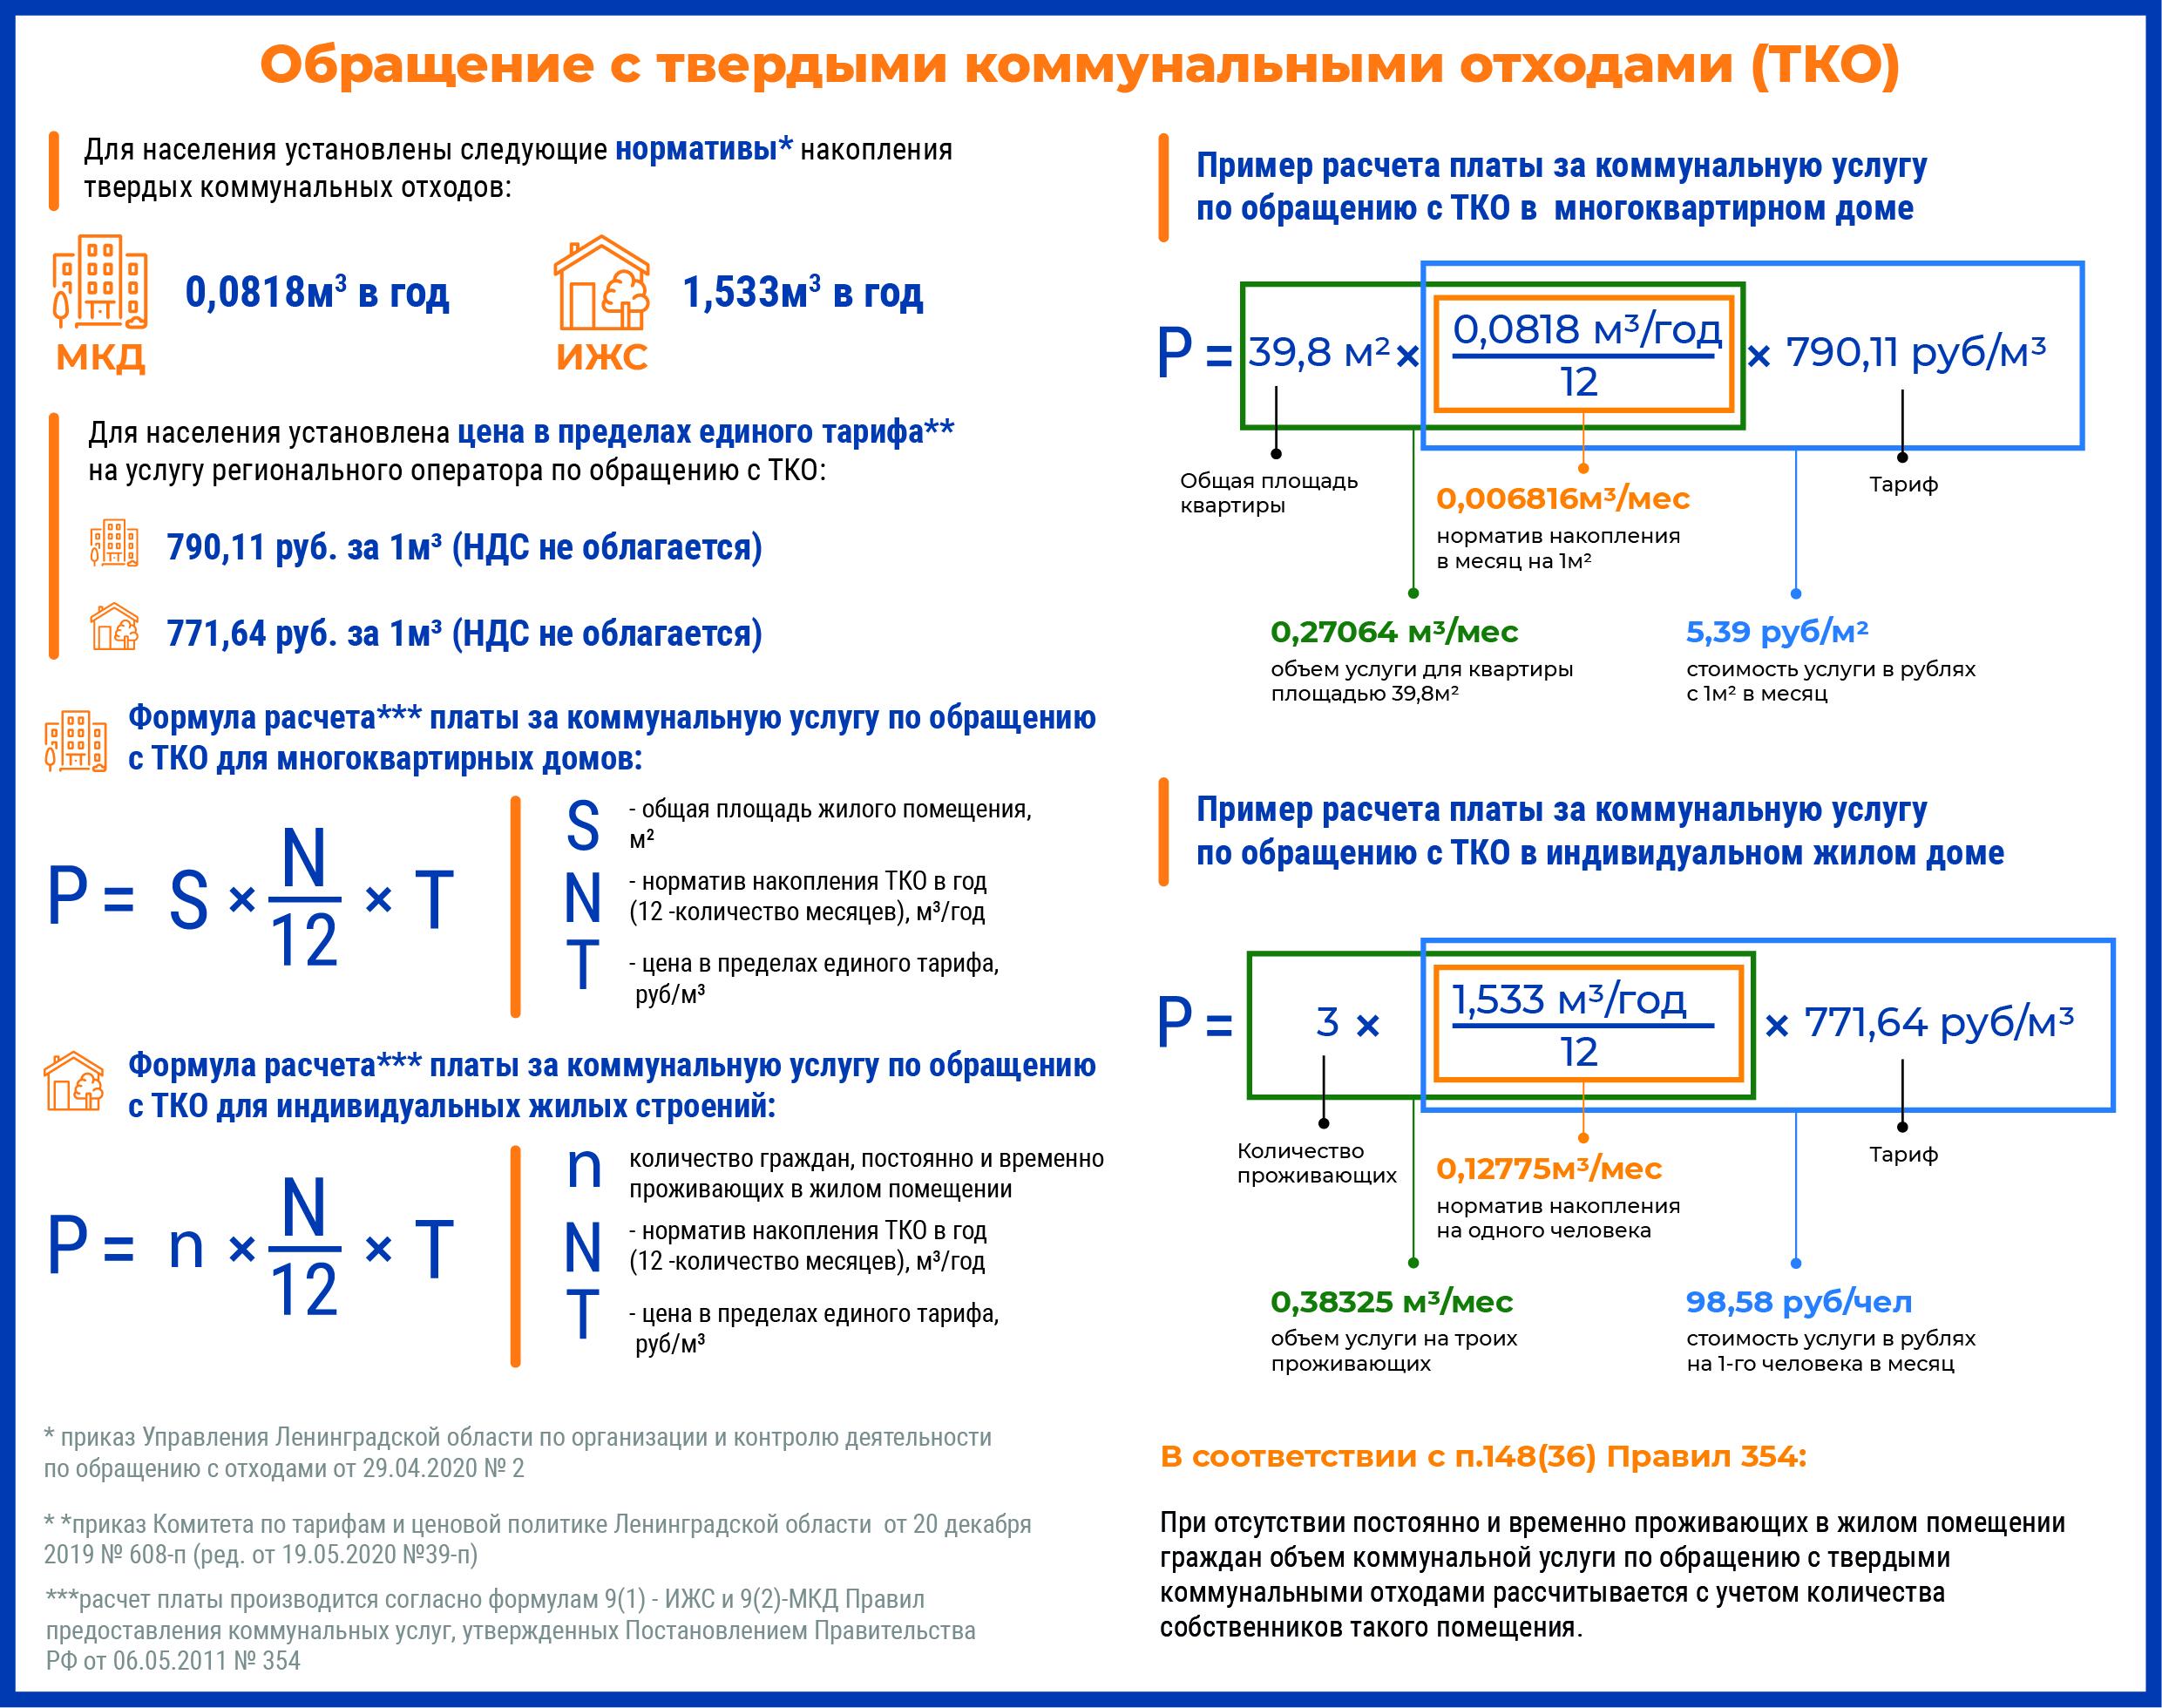 Услуга ТКО_сниженый норматив